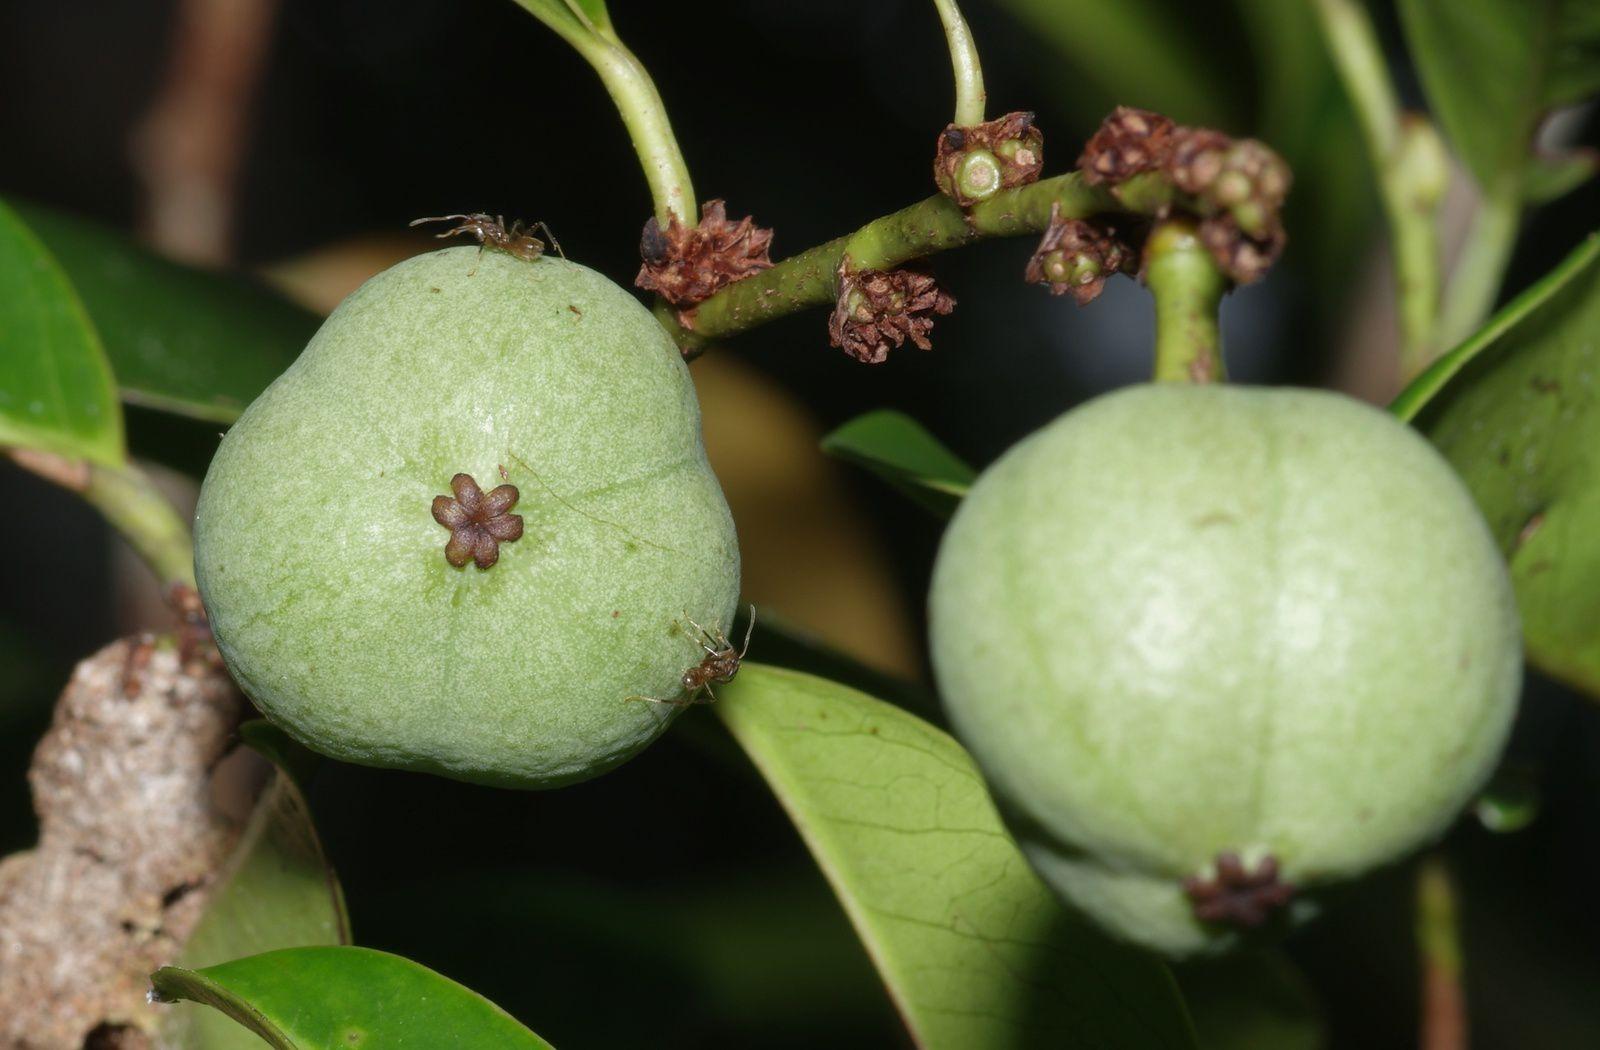 Amanoa guianensis